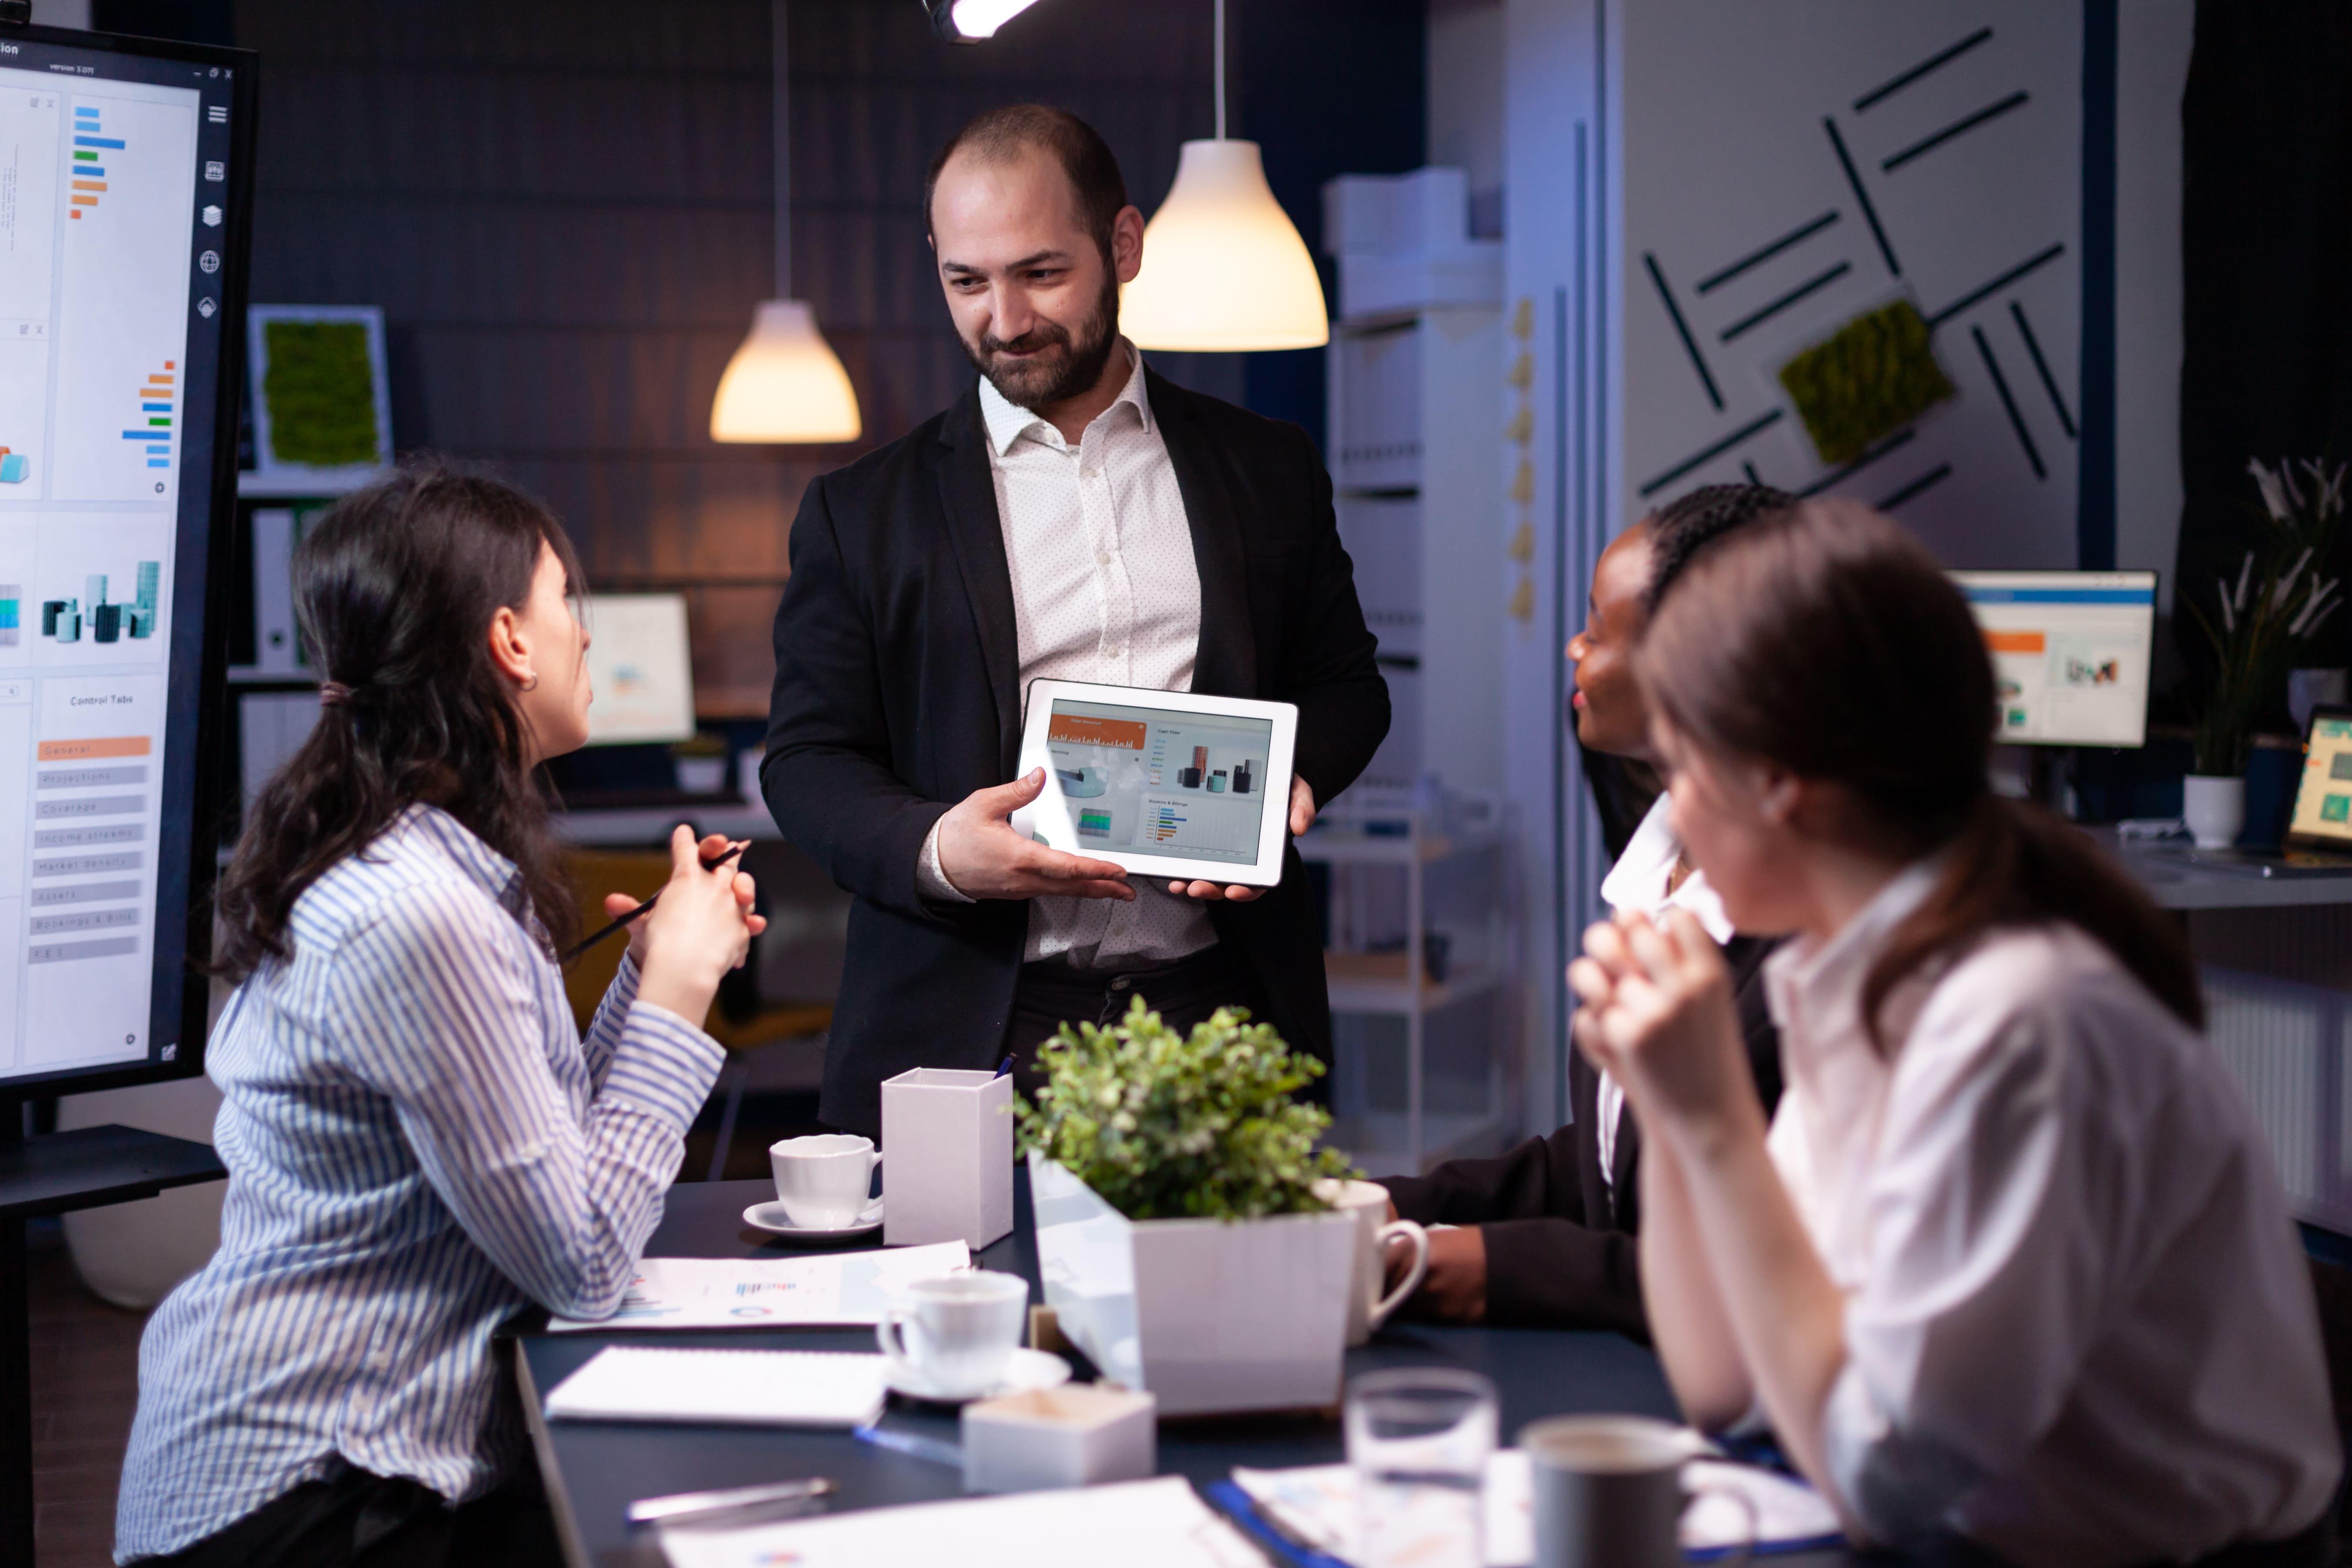 entrepreneur-businessman-showing-company-strategy--V3CACAH-min